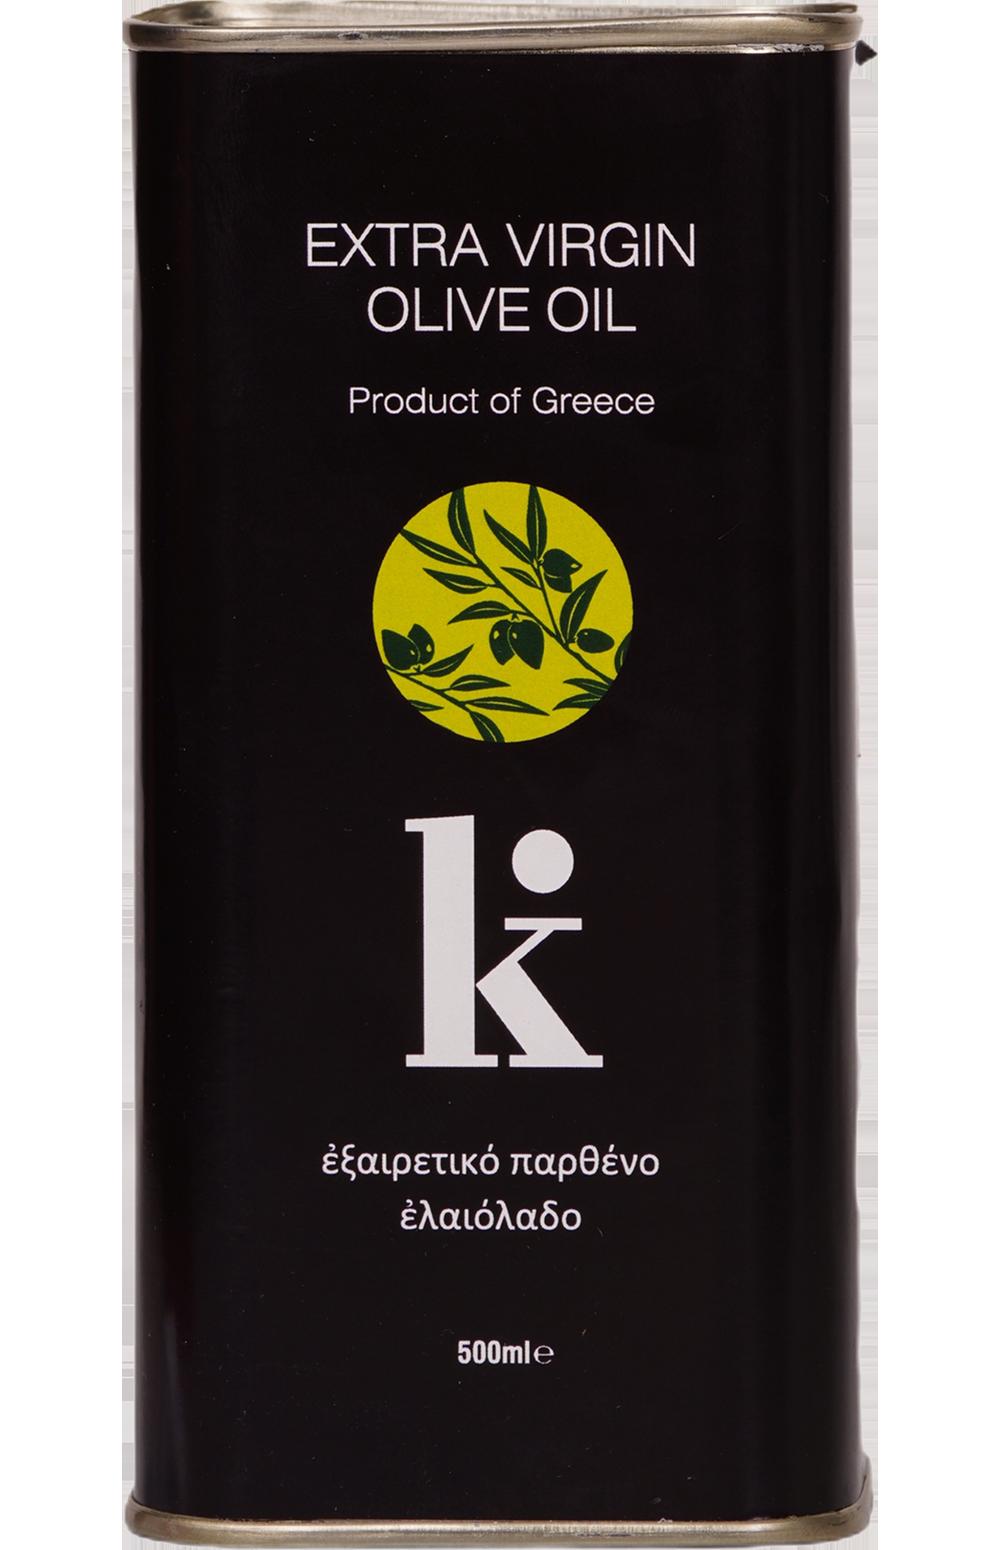 K. Extra Virgin Olive Oil